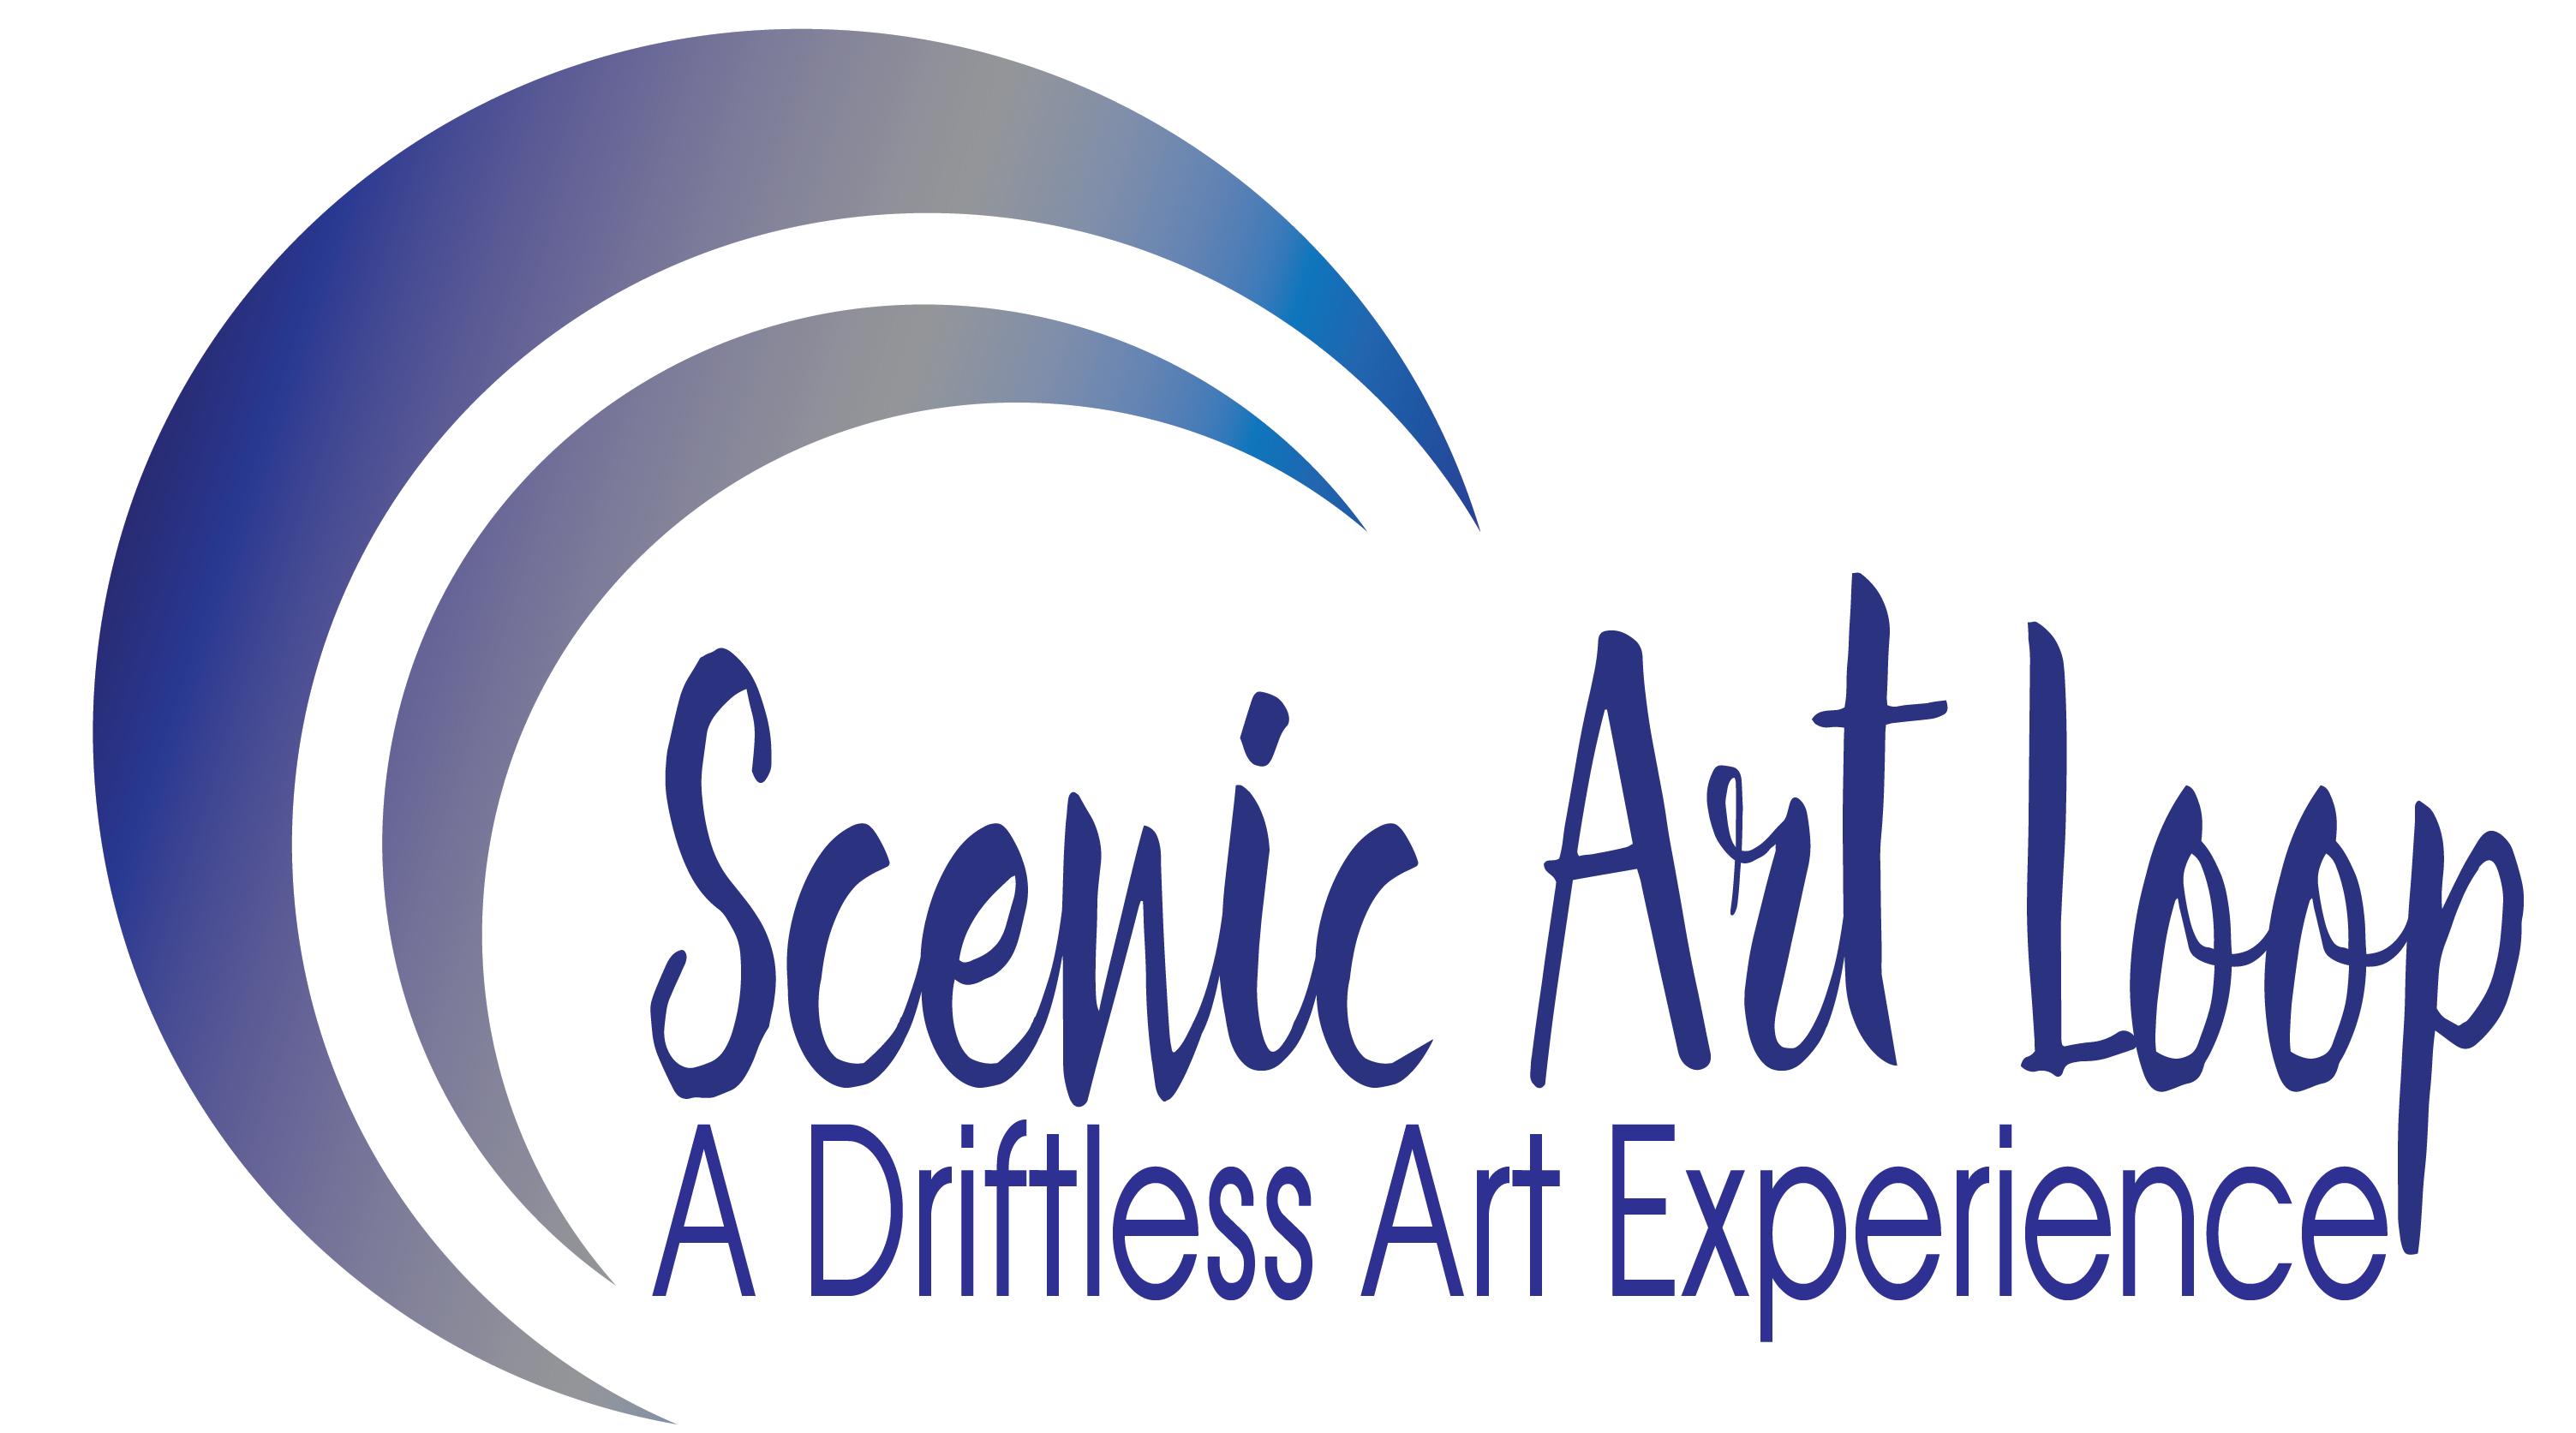 Scenic Art Loop